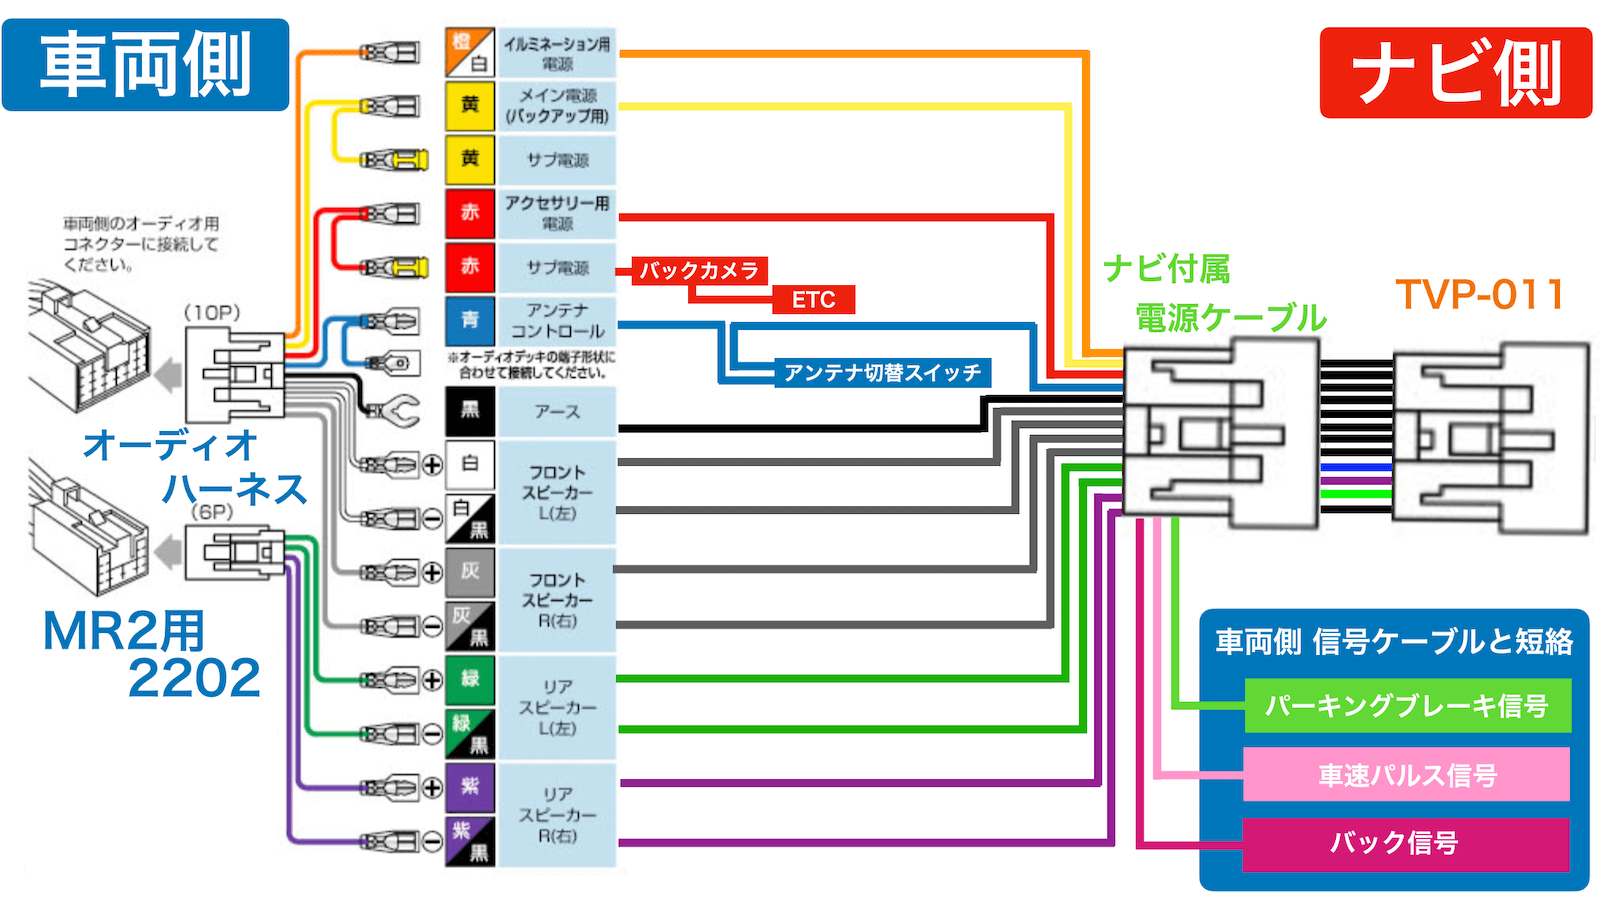 MR2 audio harness-navigation connection diagram